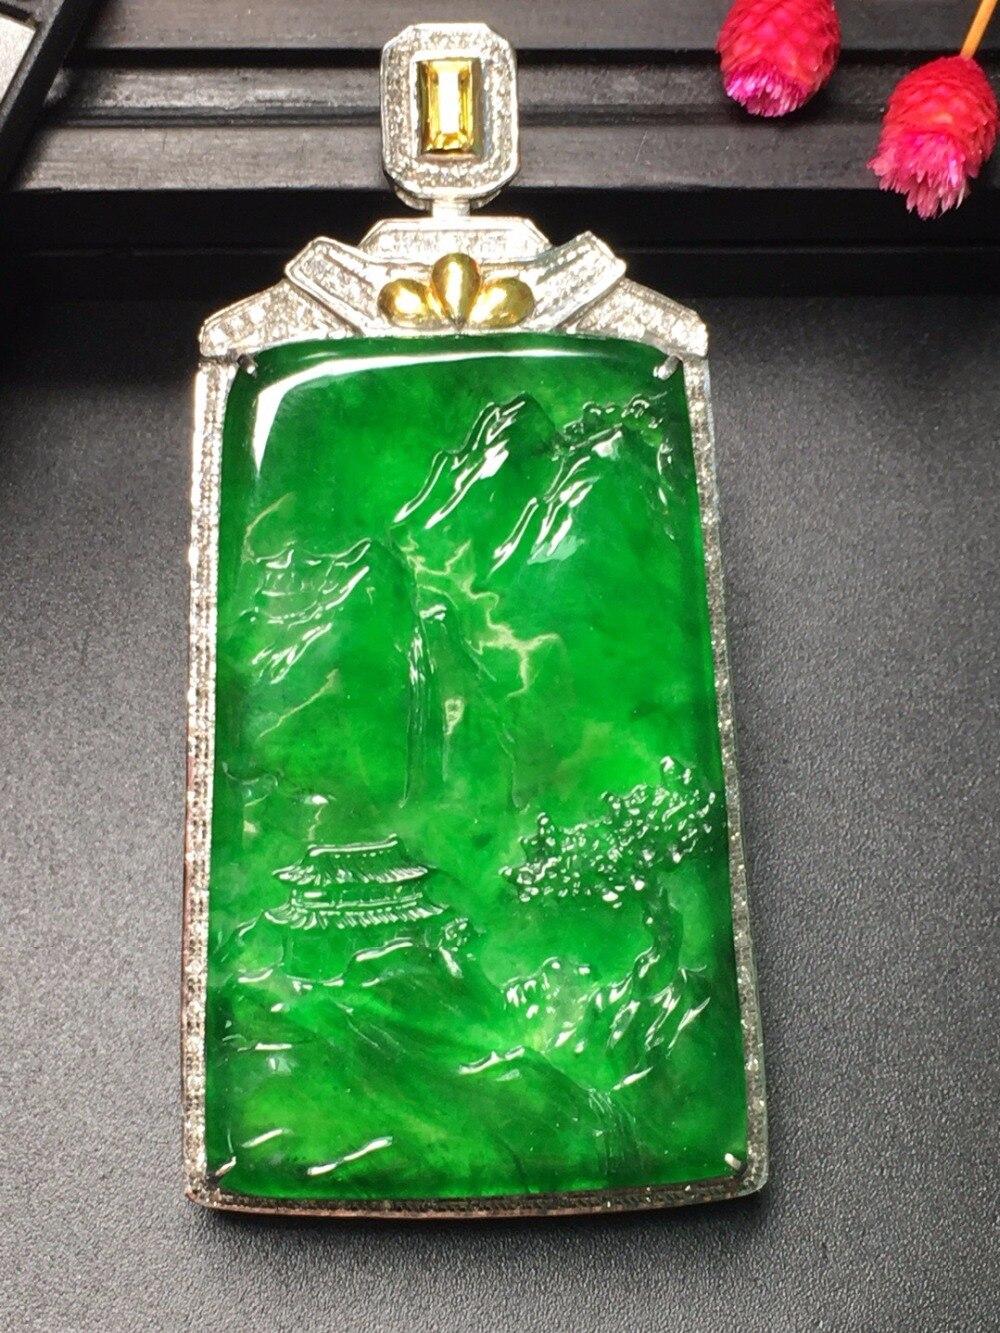 18.10.6 Collection Burmes Real 18K Gold AU750 LOVE 100% Natural Green Jade Gemstone Chicken Myanmer Origin for Women Gift